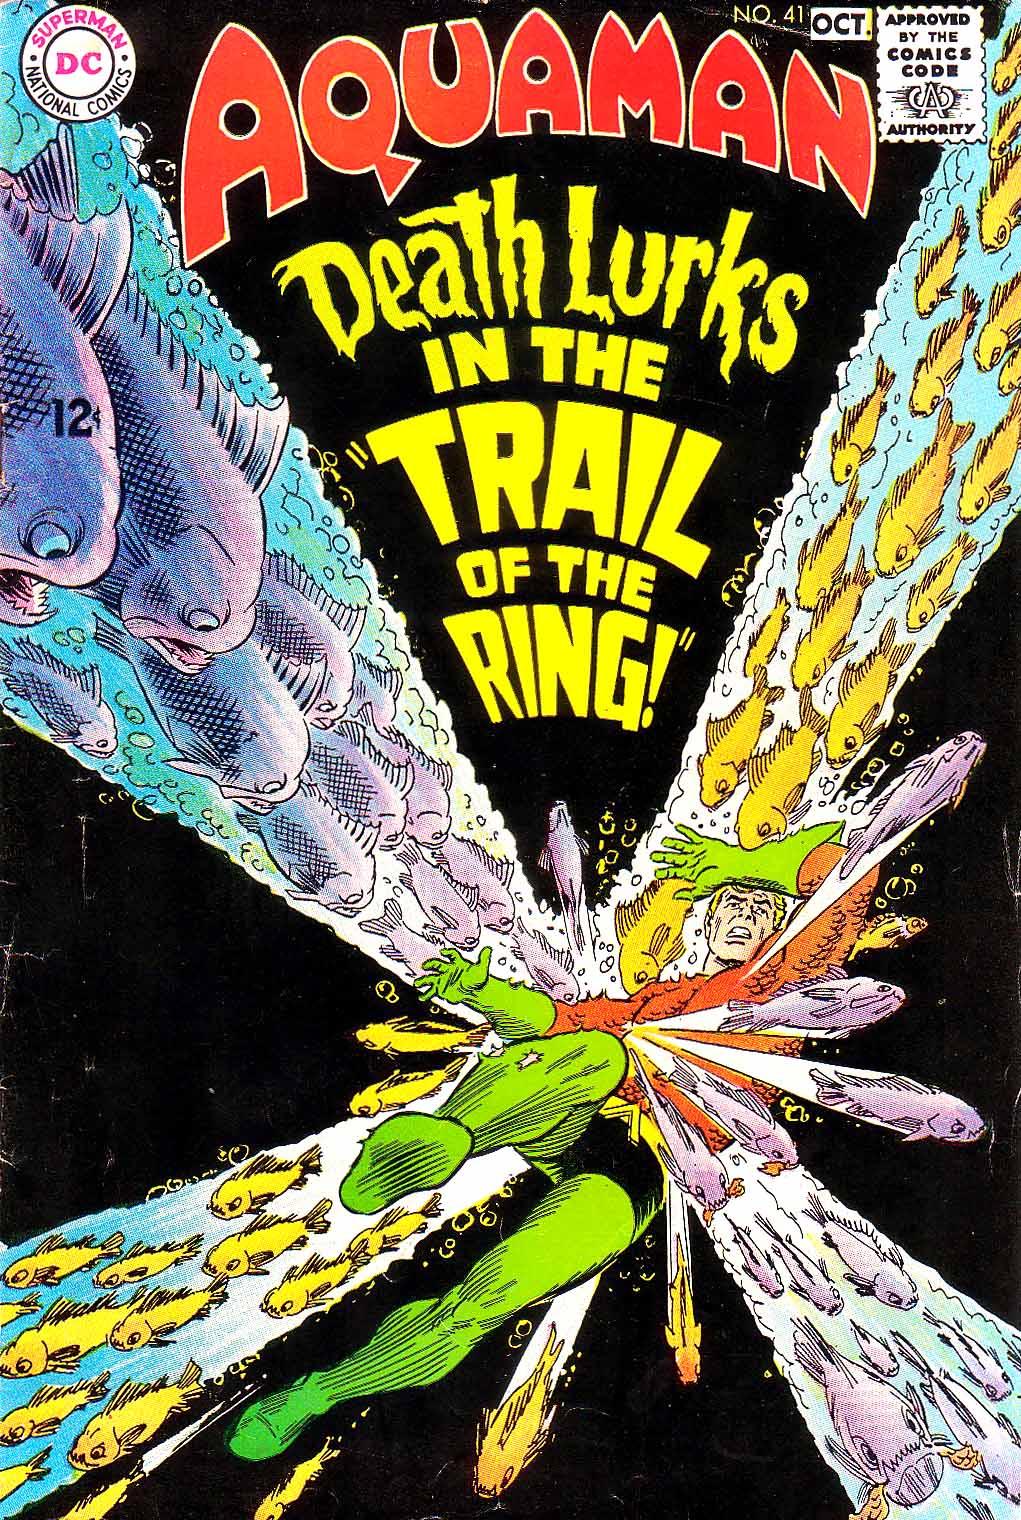 Read online Aquaman (1962) comic -  Issue #41 - 1